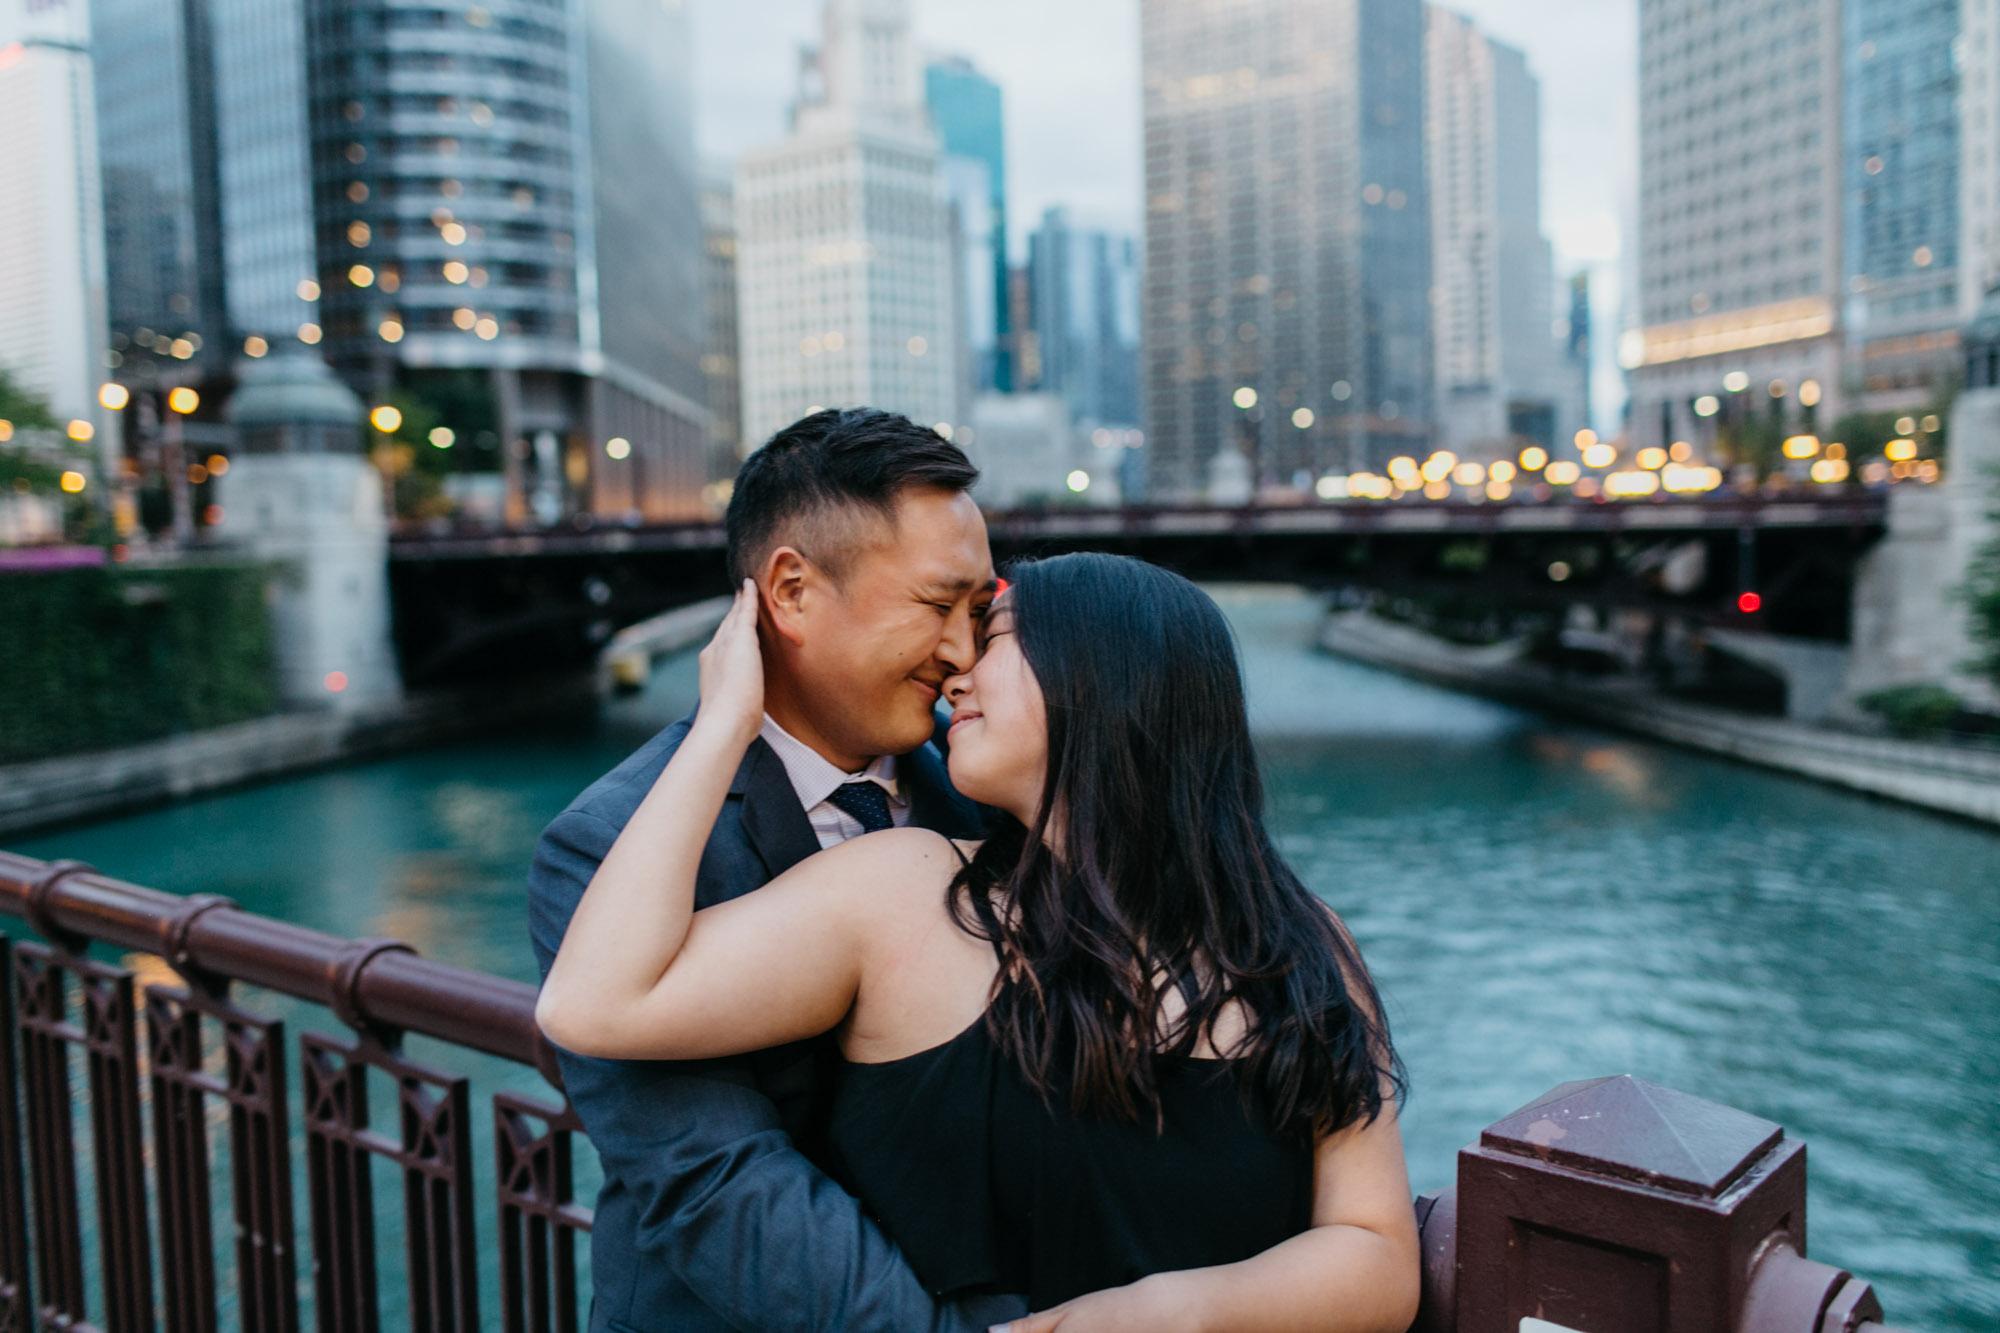 chicago-engagement-photographer-11.jpg